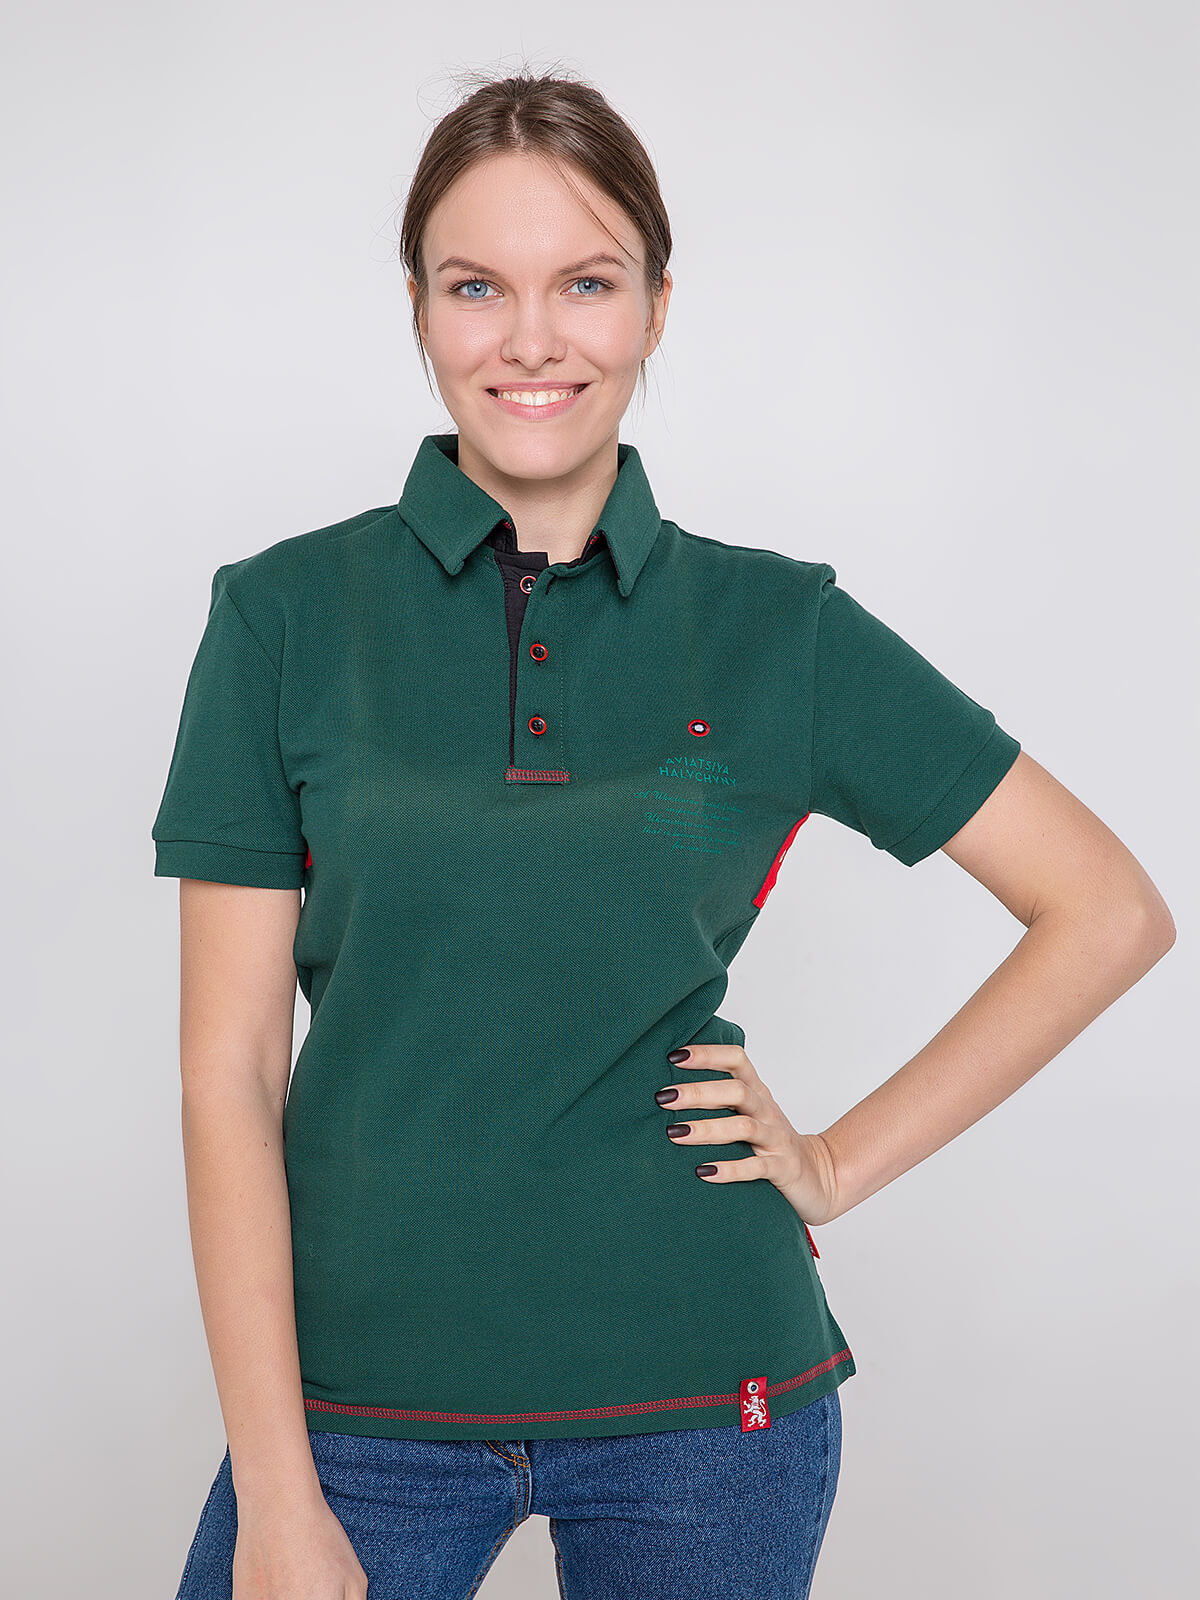 Women's Polo Shirt Wings. Color dark green. Unisex polo (men's sizes).